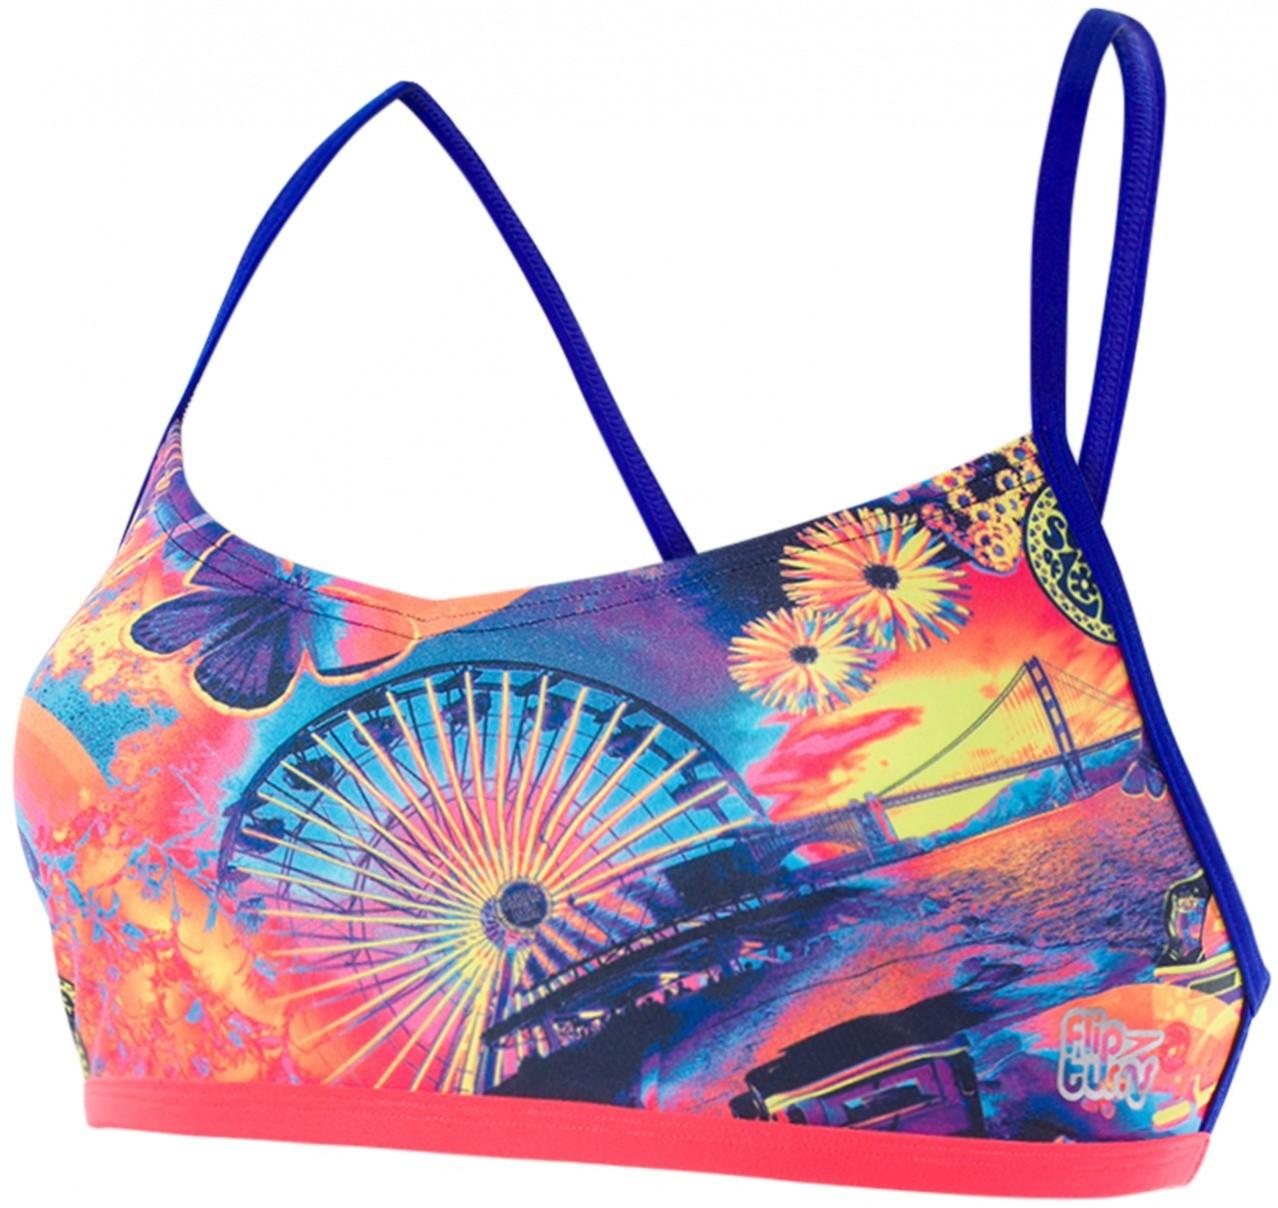 Speedo hi five flash ribbonback top navy/chroma blue/neon